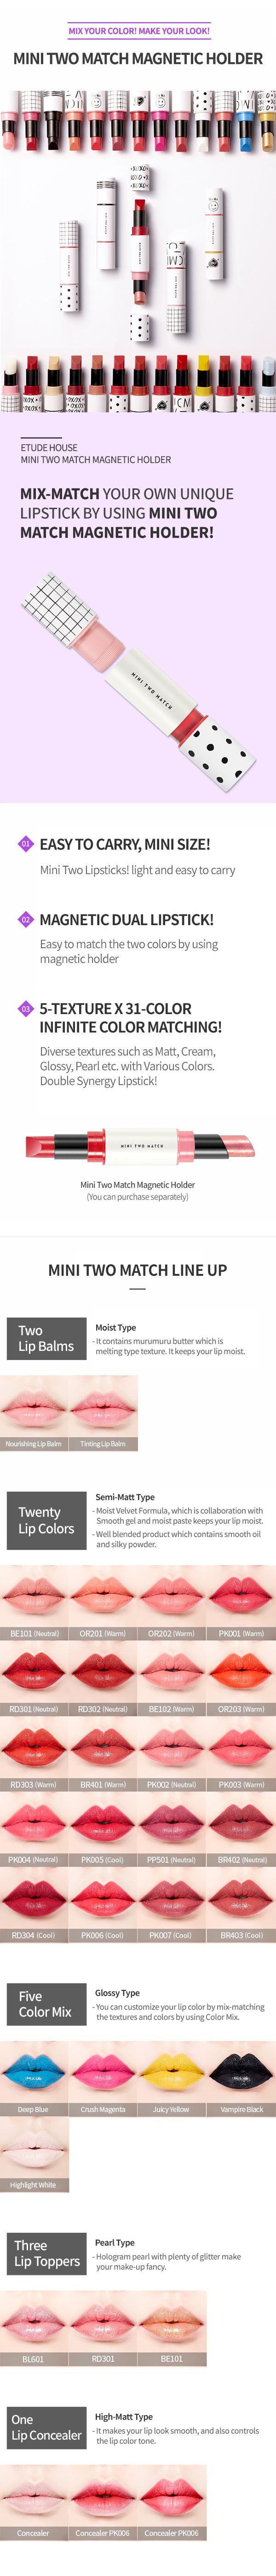 20180115 mini two match magnetic holder des - فروشگاه اینترنتی می شاپ